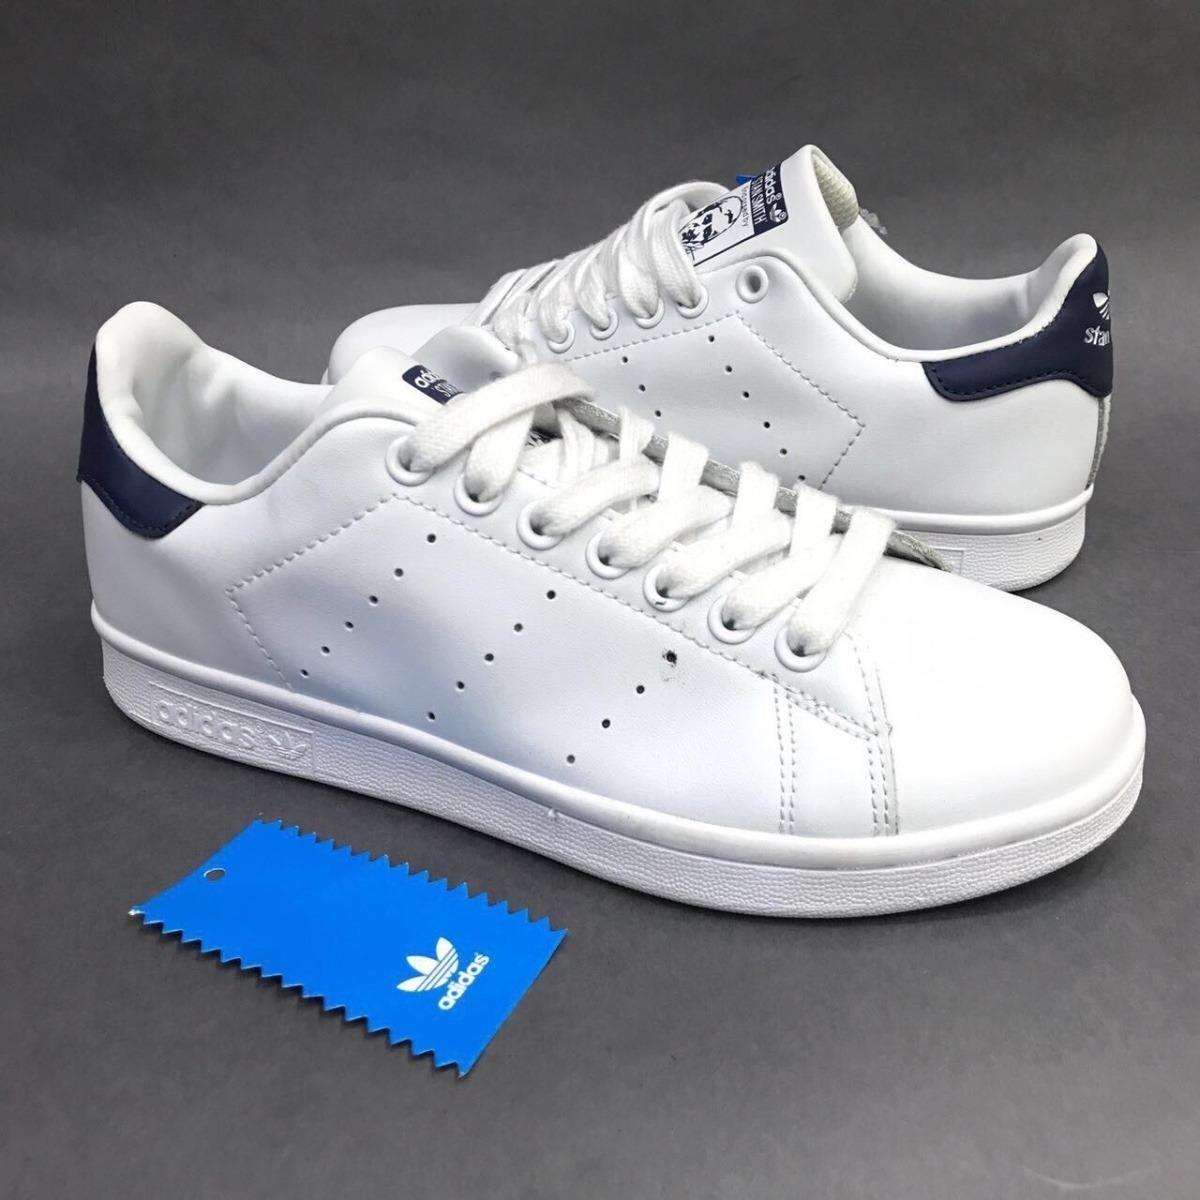 cheap for discount a821f f4f59 tenis zapatillas adidas stan smith blanca hombre env ...